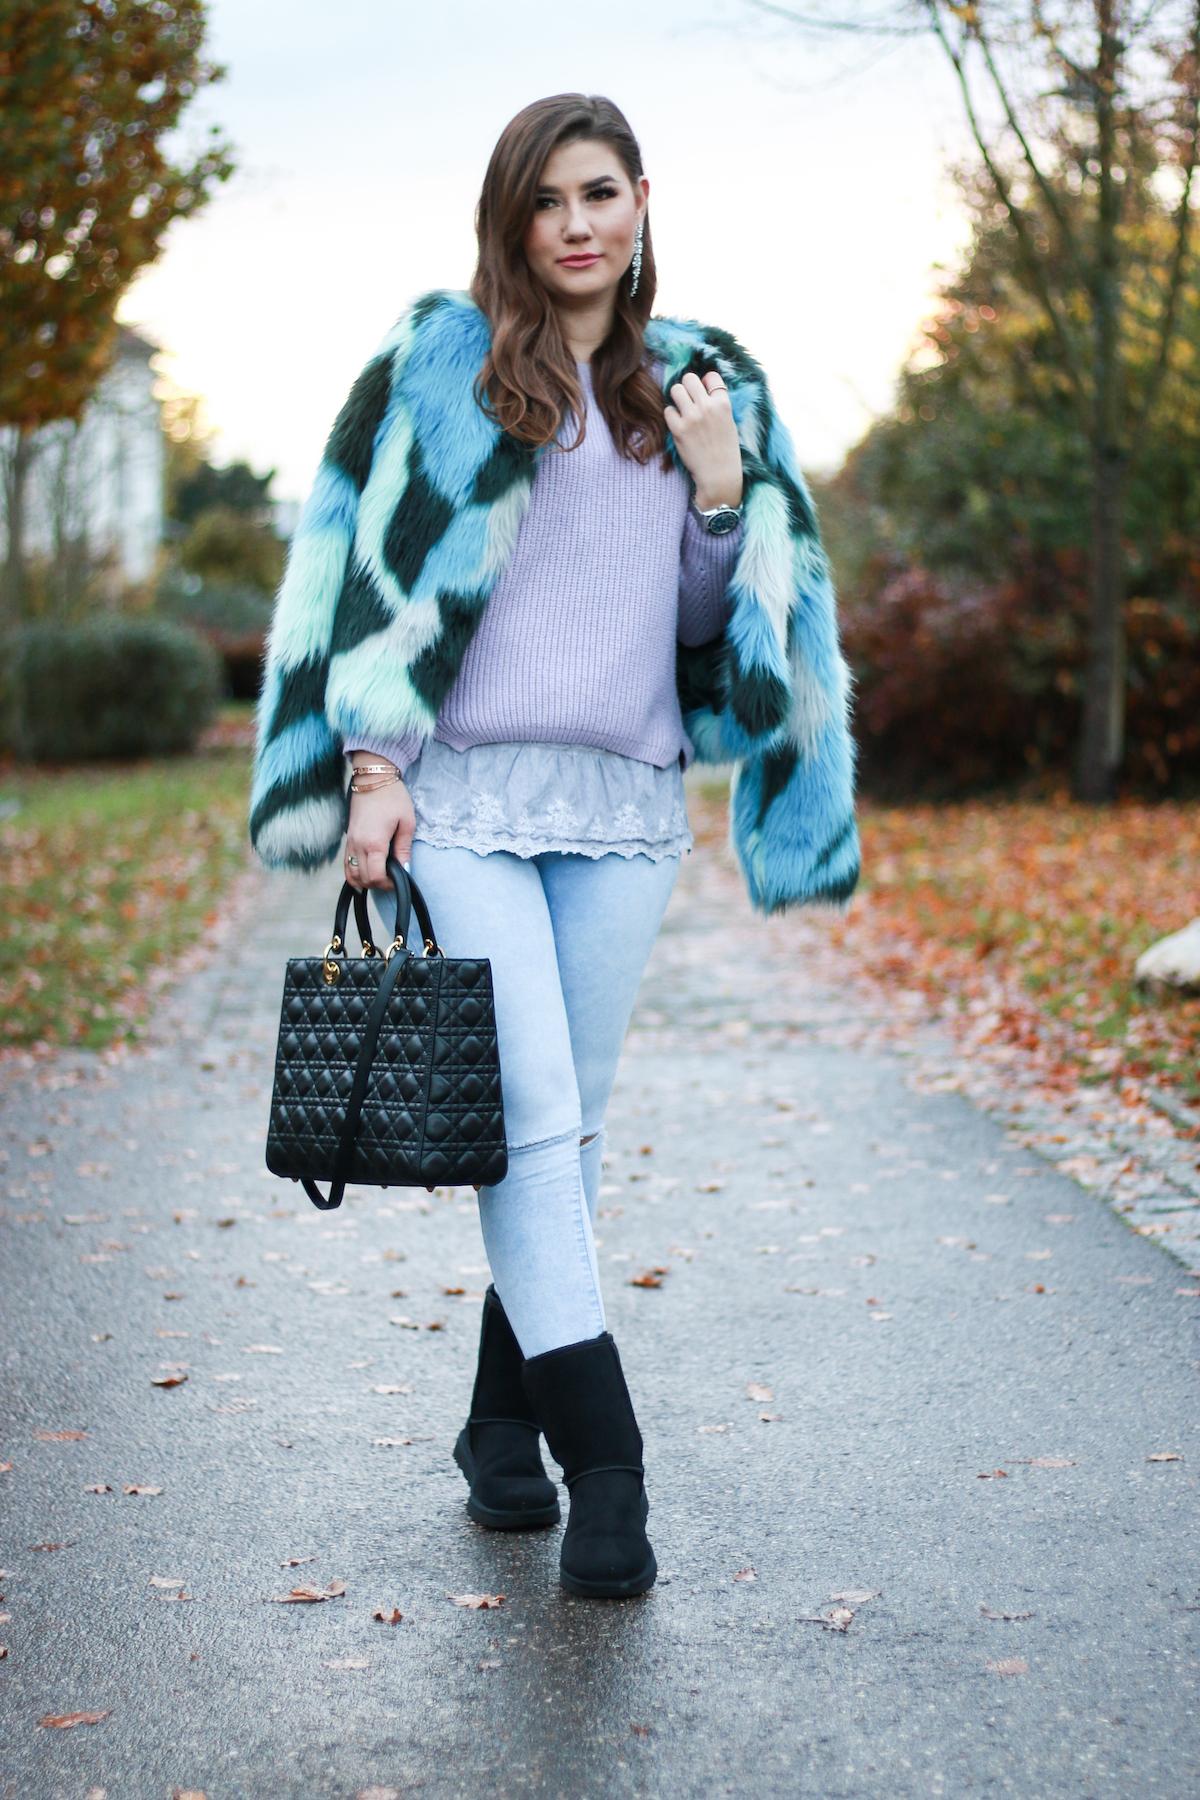 sara-bow-winter-outfit-armani-jacke-pelz